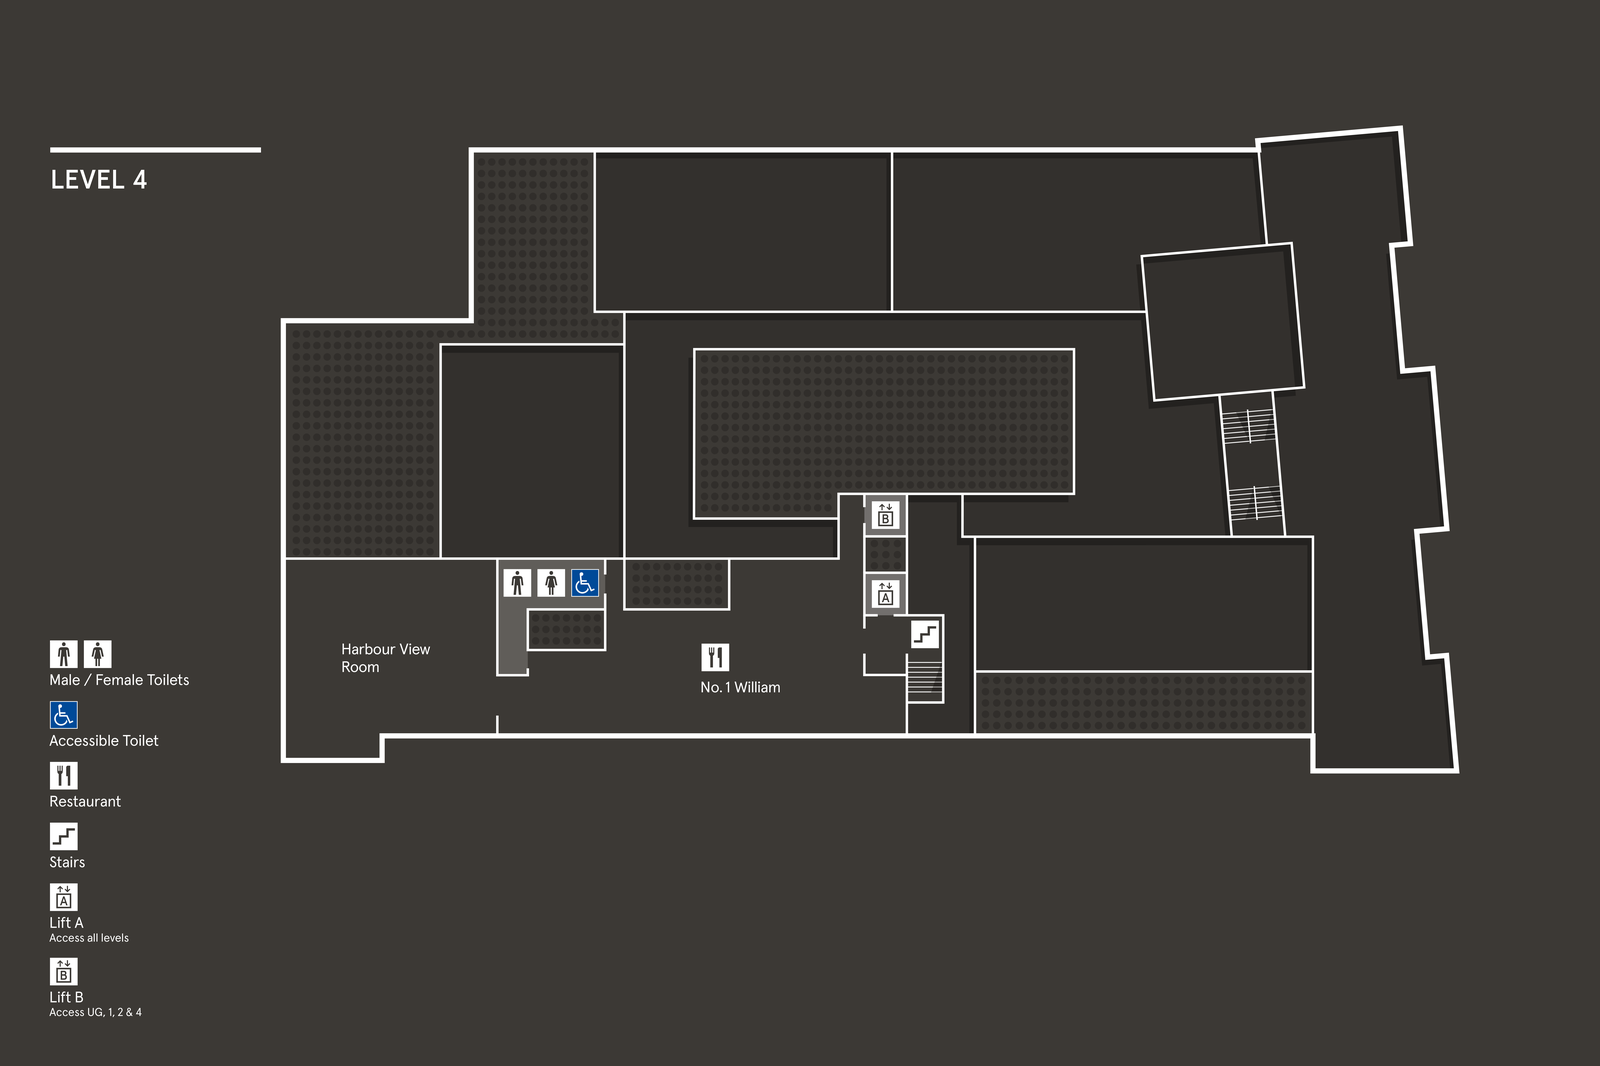 AM Map - Level 4